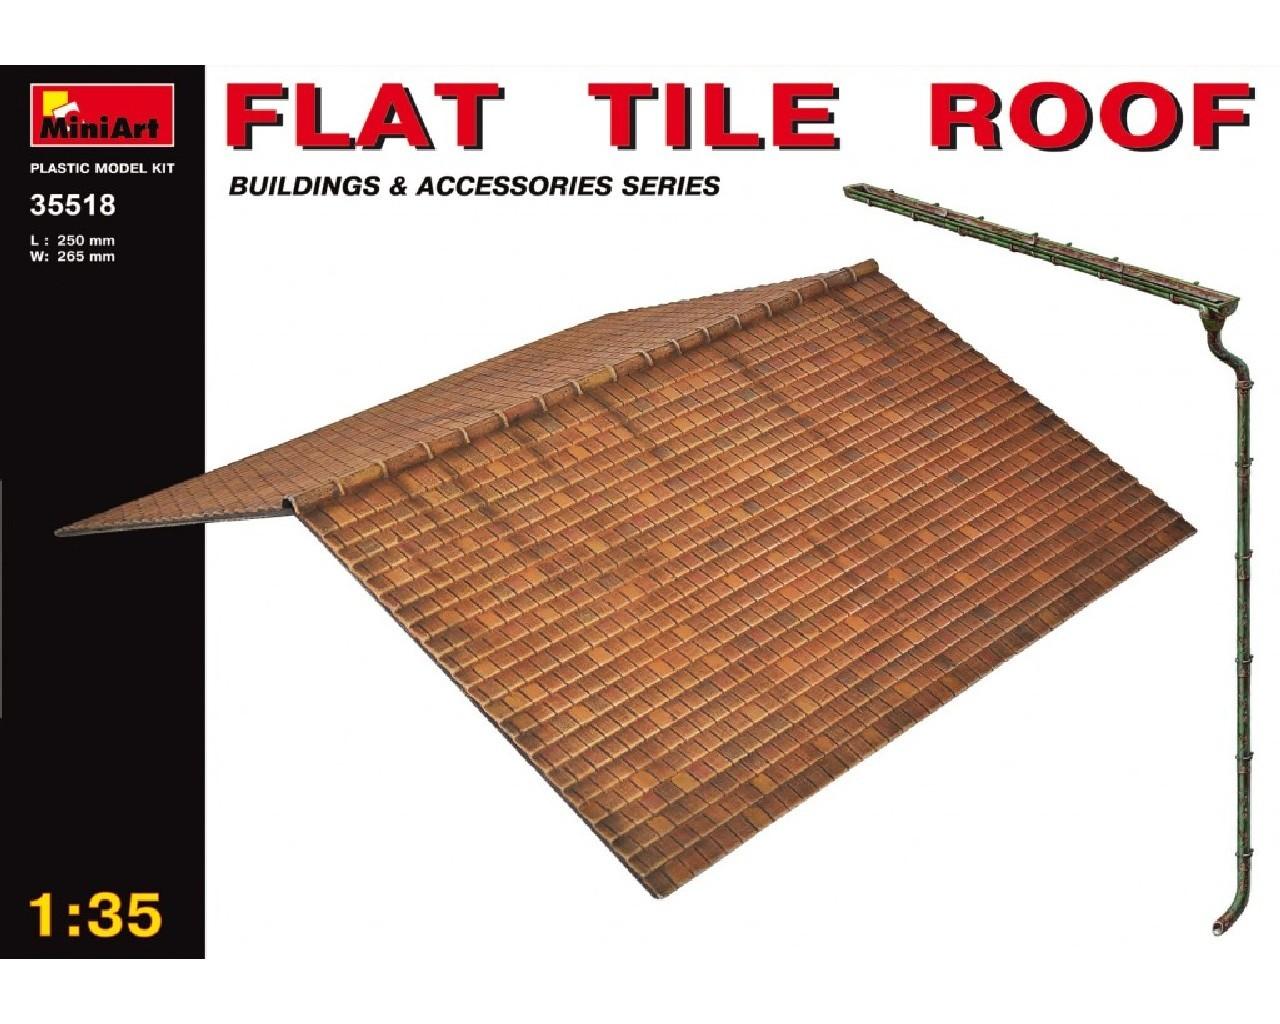 1/35 Flat Tile Roof